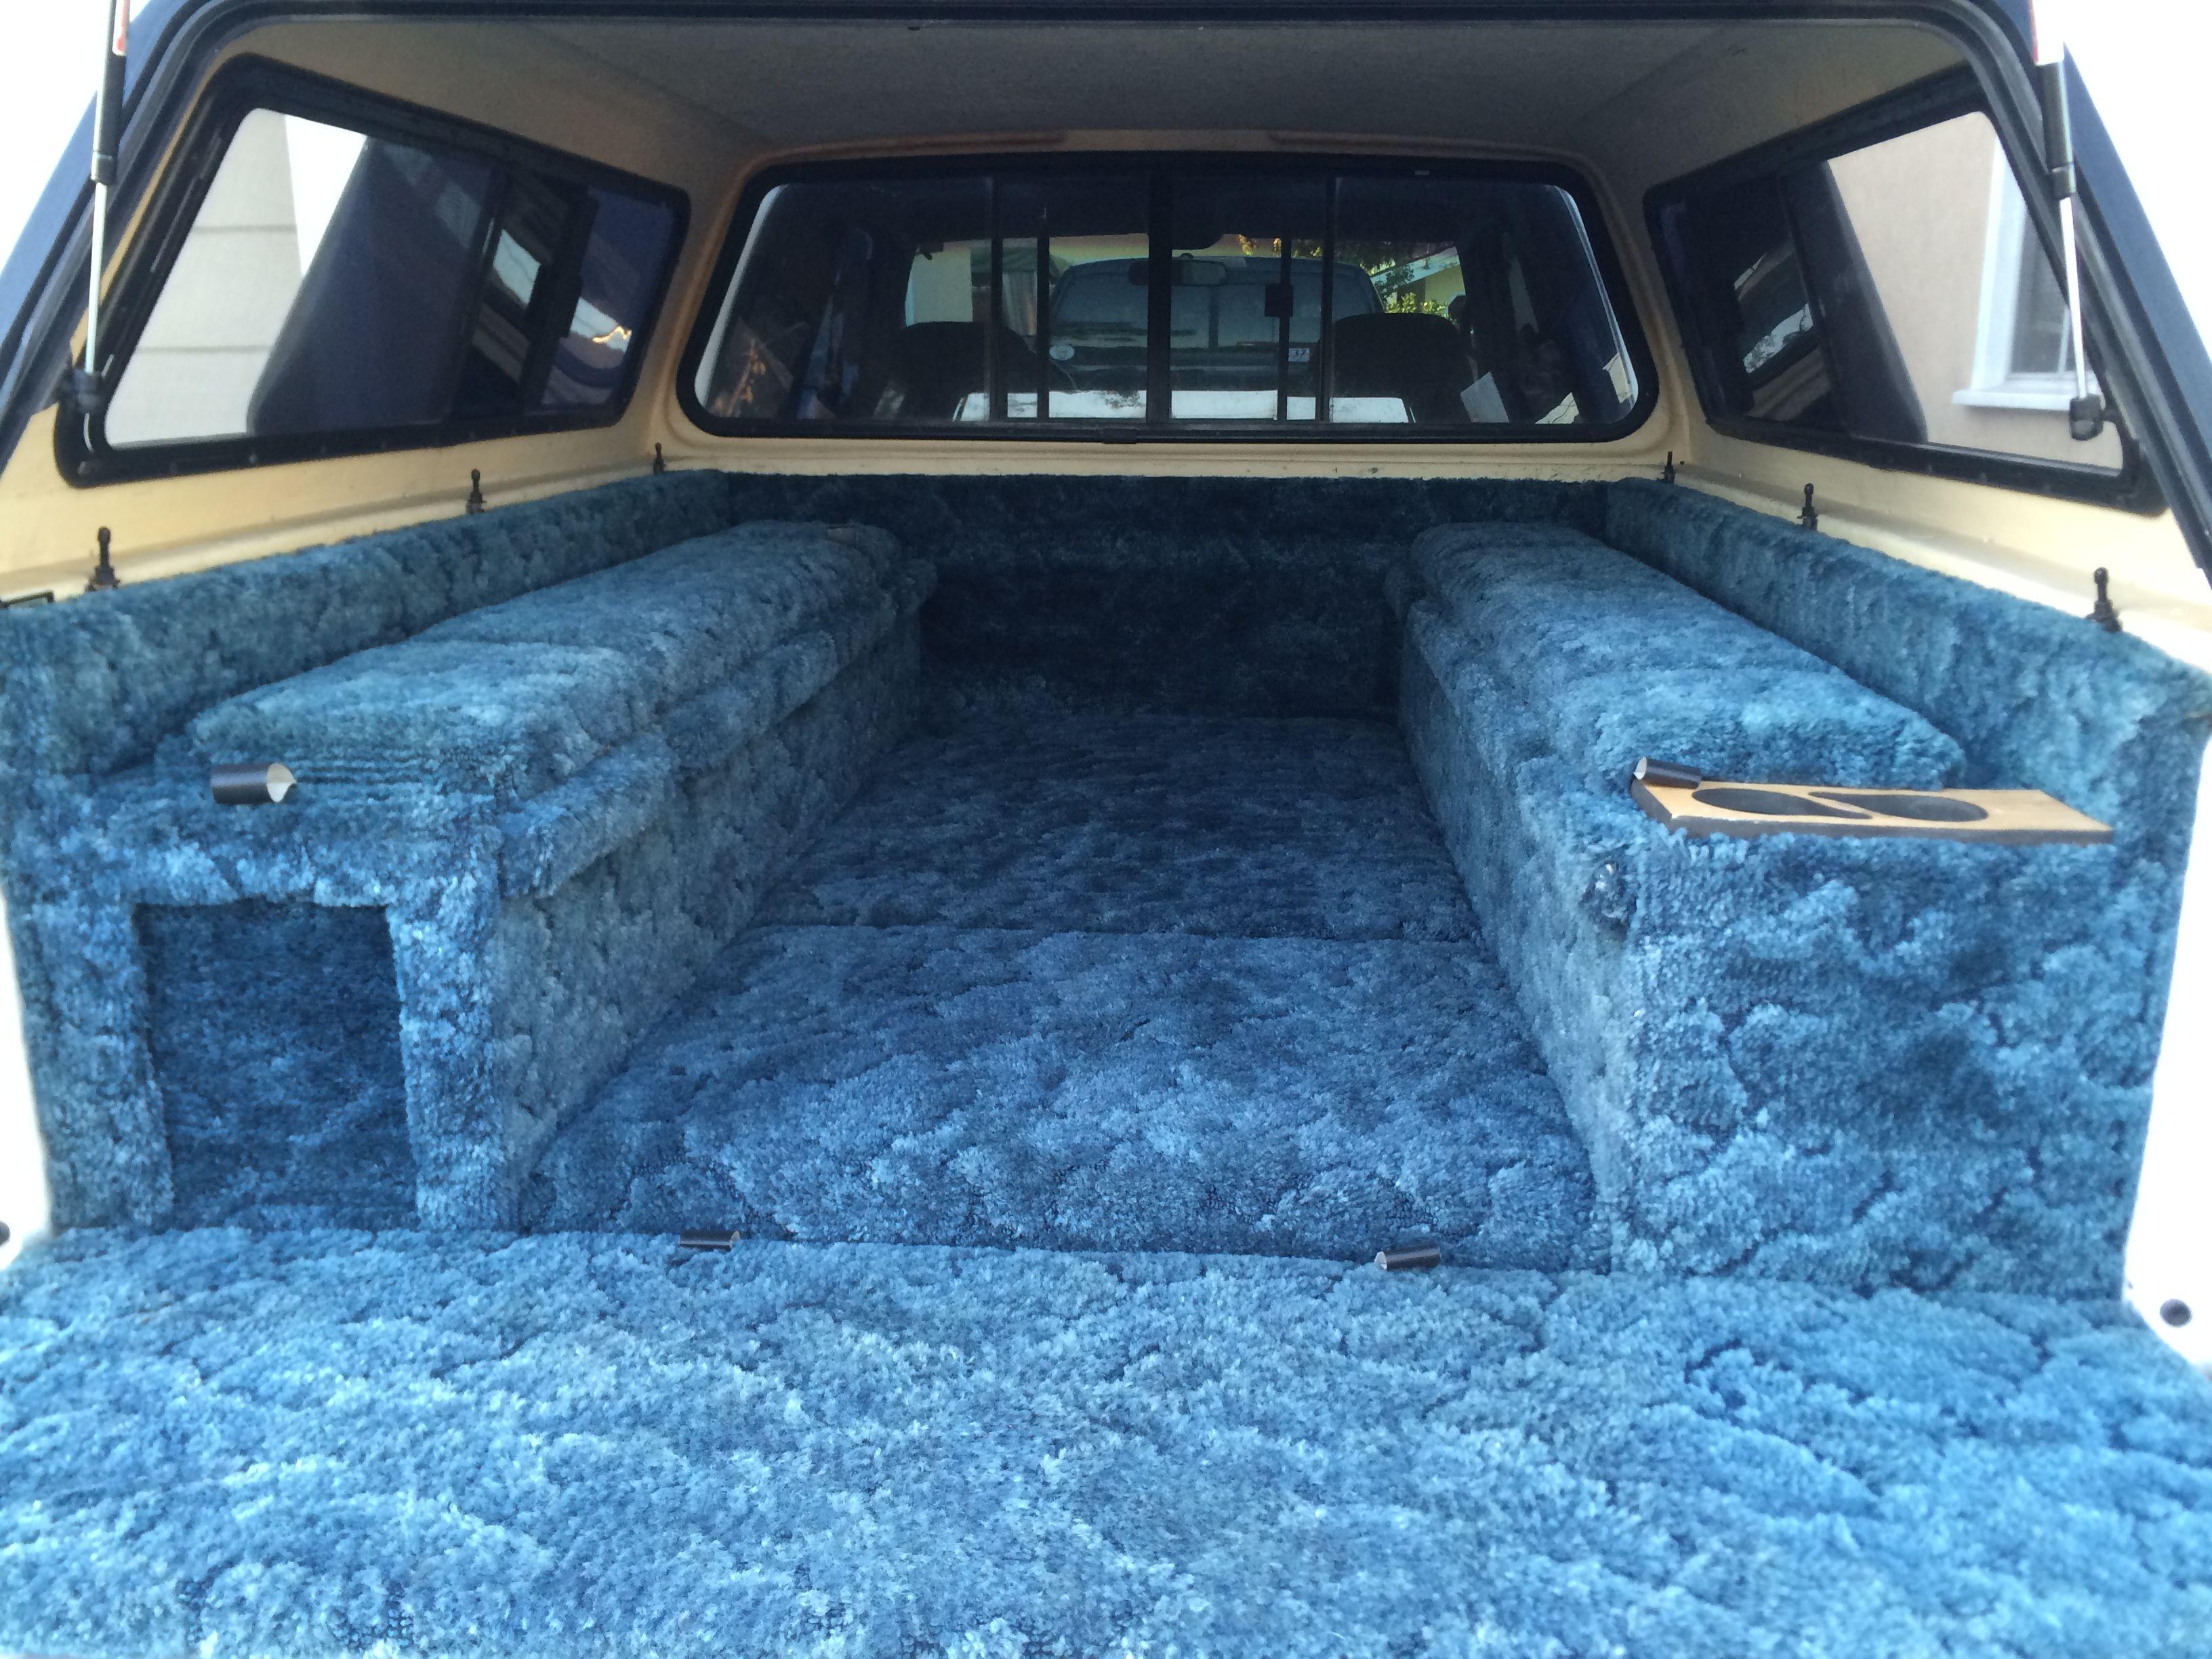 25 year old Lee Anderson custom carpet kit. Truck